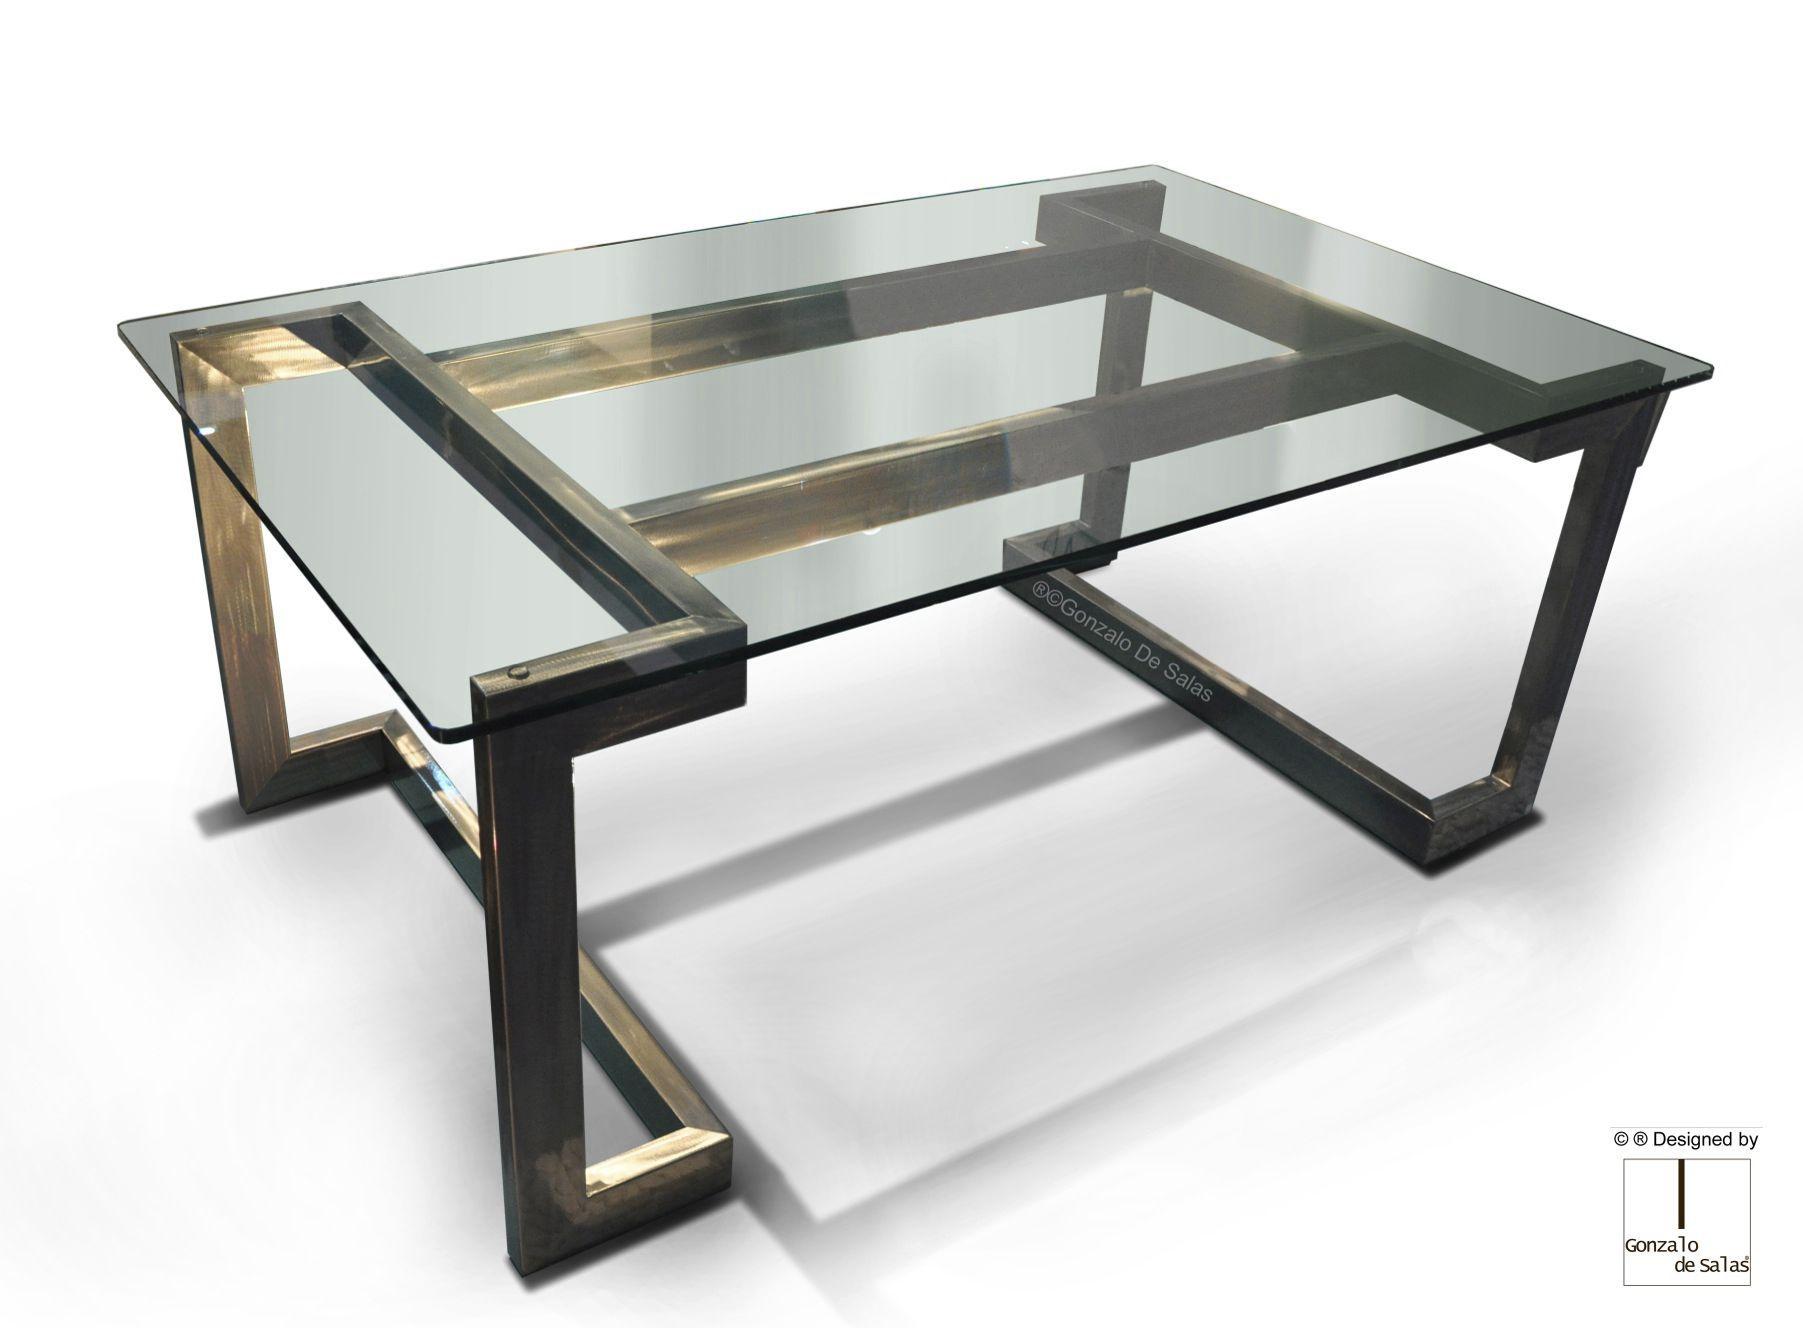 Bureau blanc design Élégant bureau design métal inox et verre